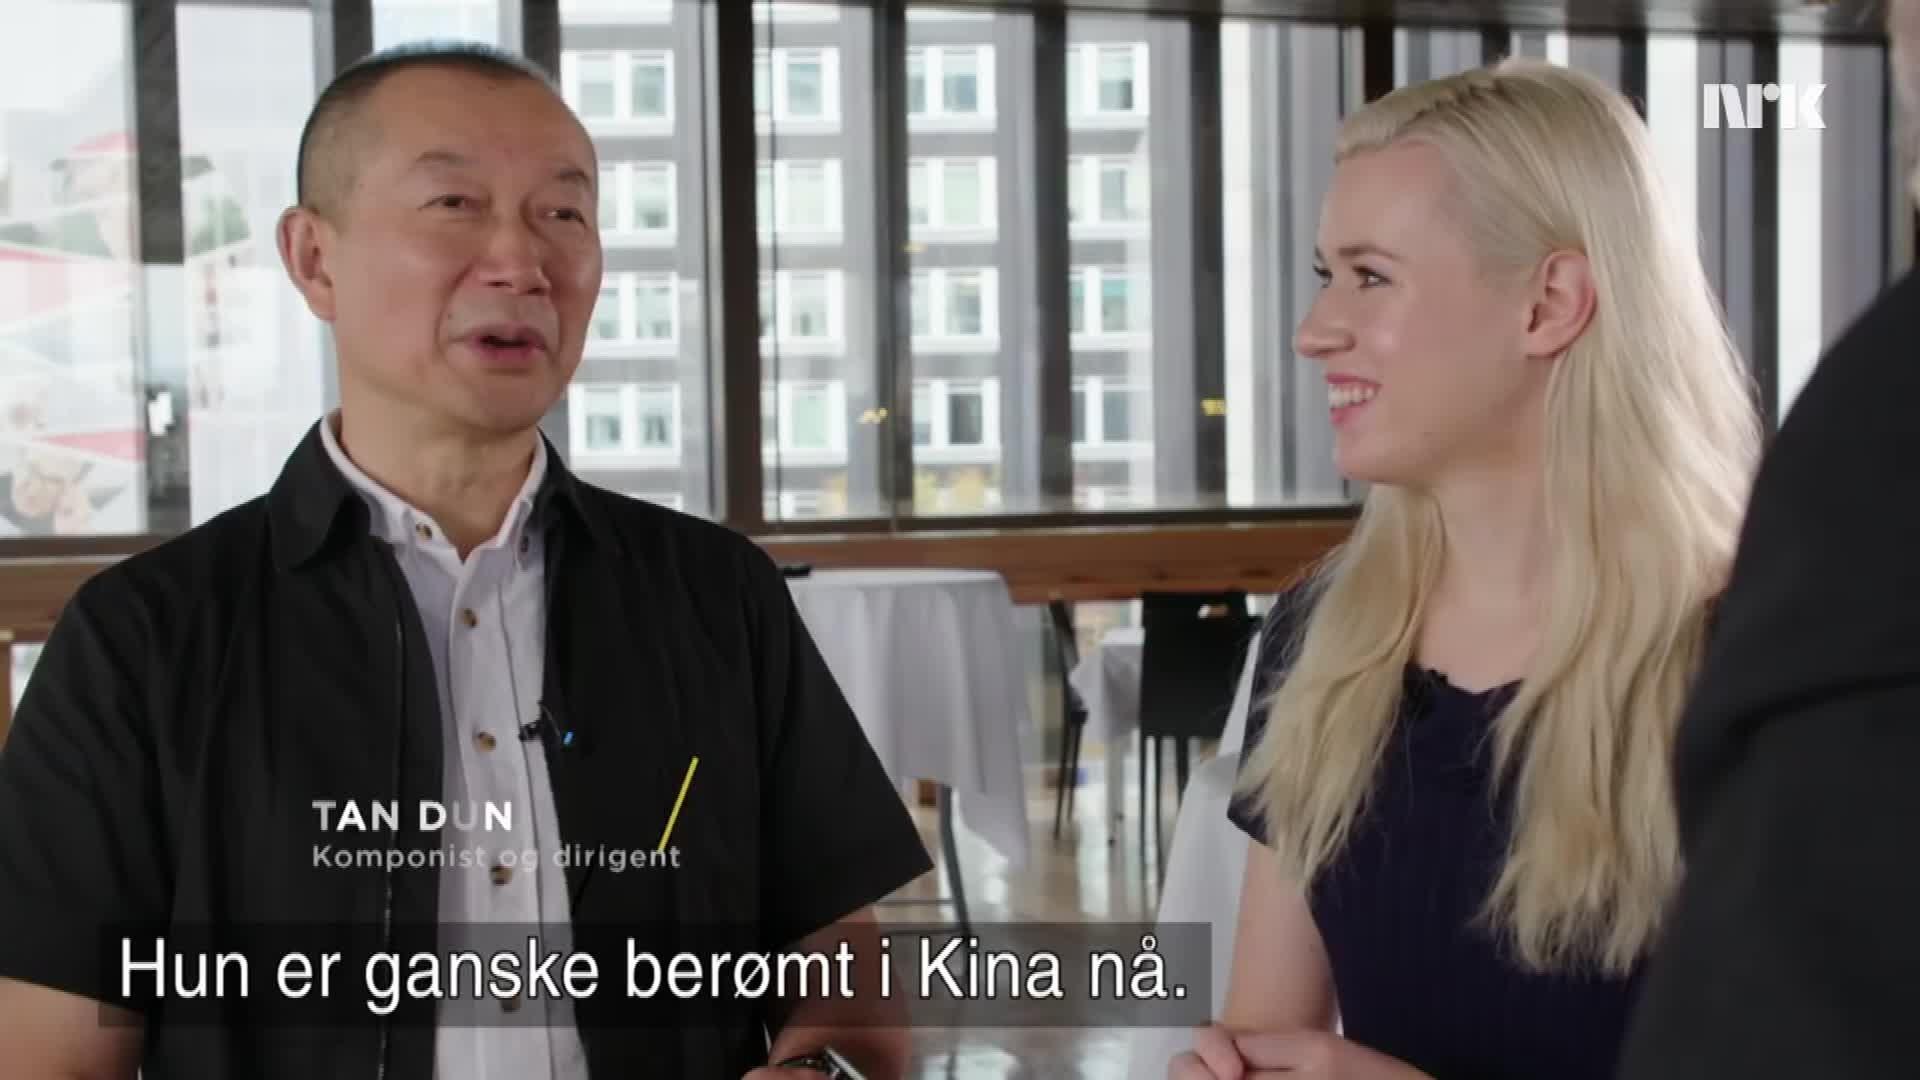 asiatisk dating i trondheim har aldri vært bedre